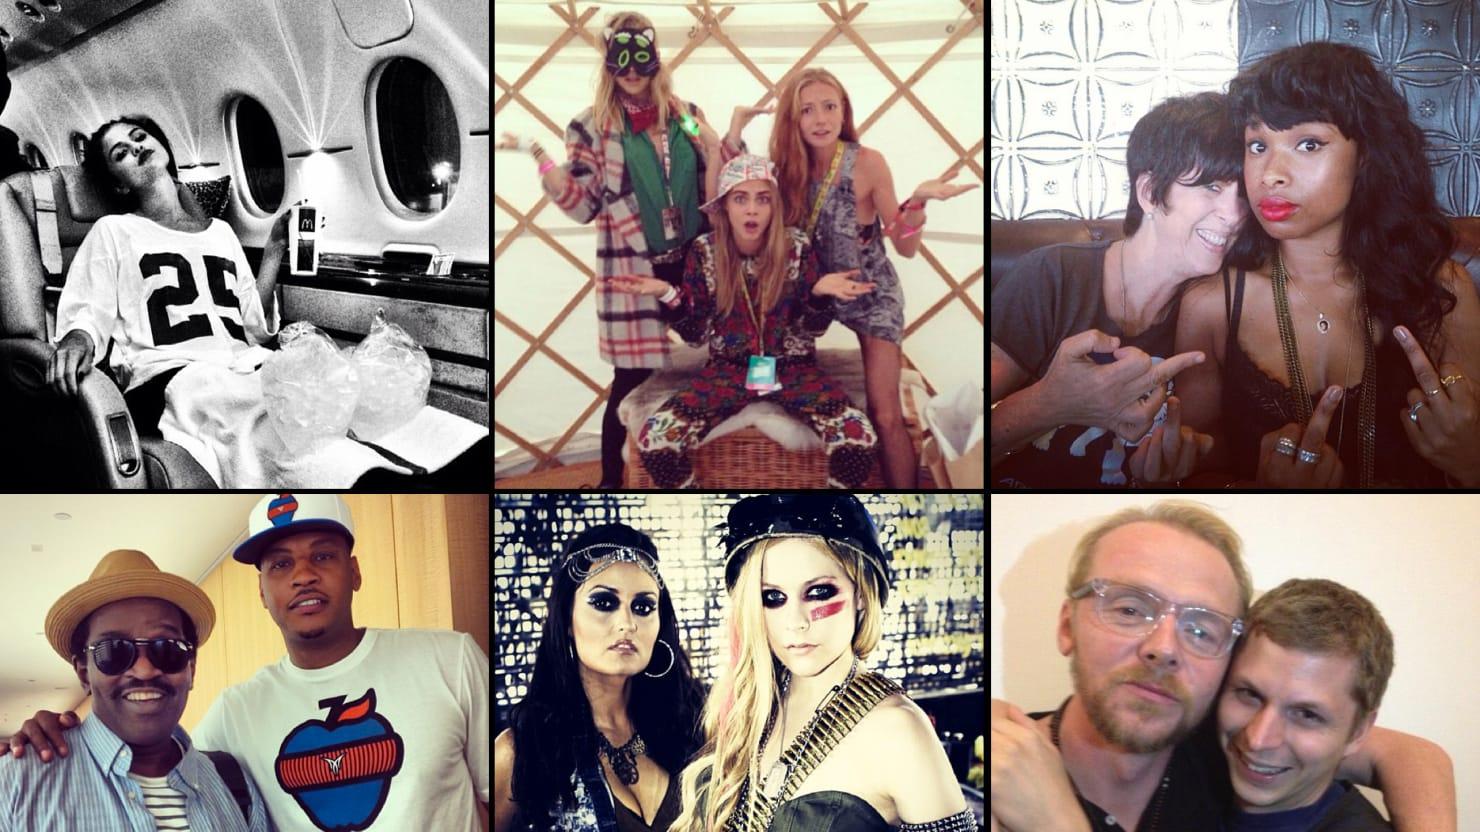 Jennifer Hudson, Selena Gomez & More Celebrity Twitter Pictures (PHOTOS)